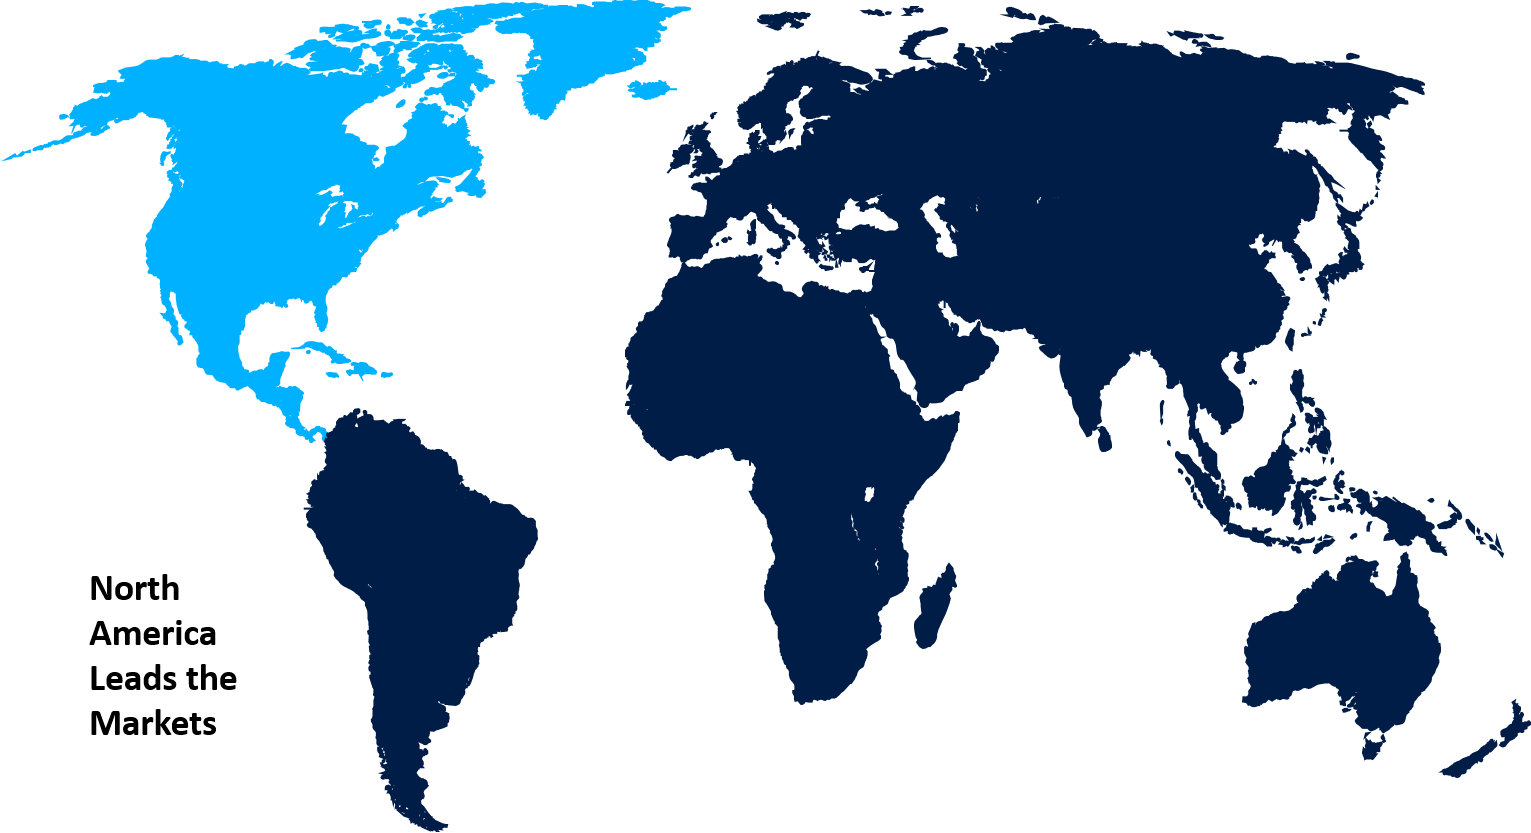 North America DDoS protection and mitigation market